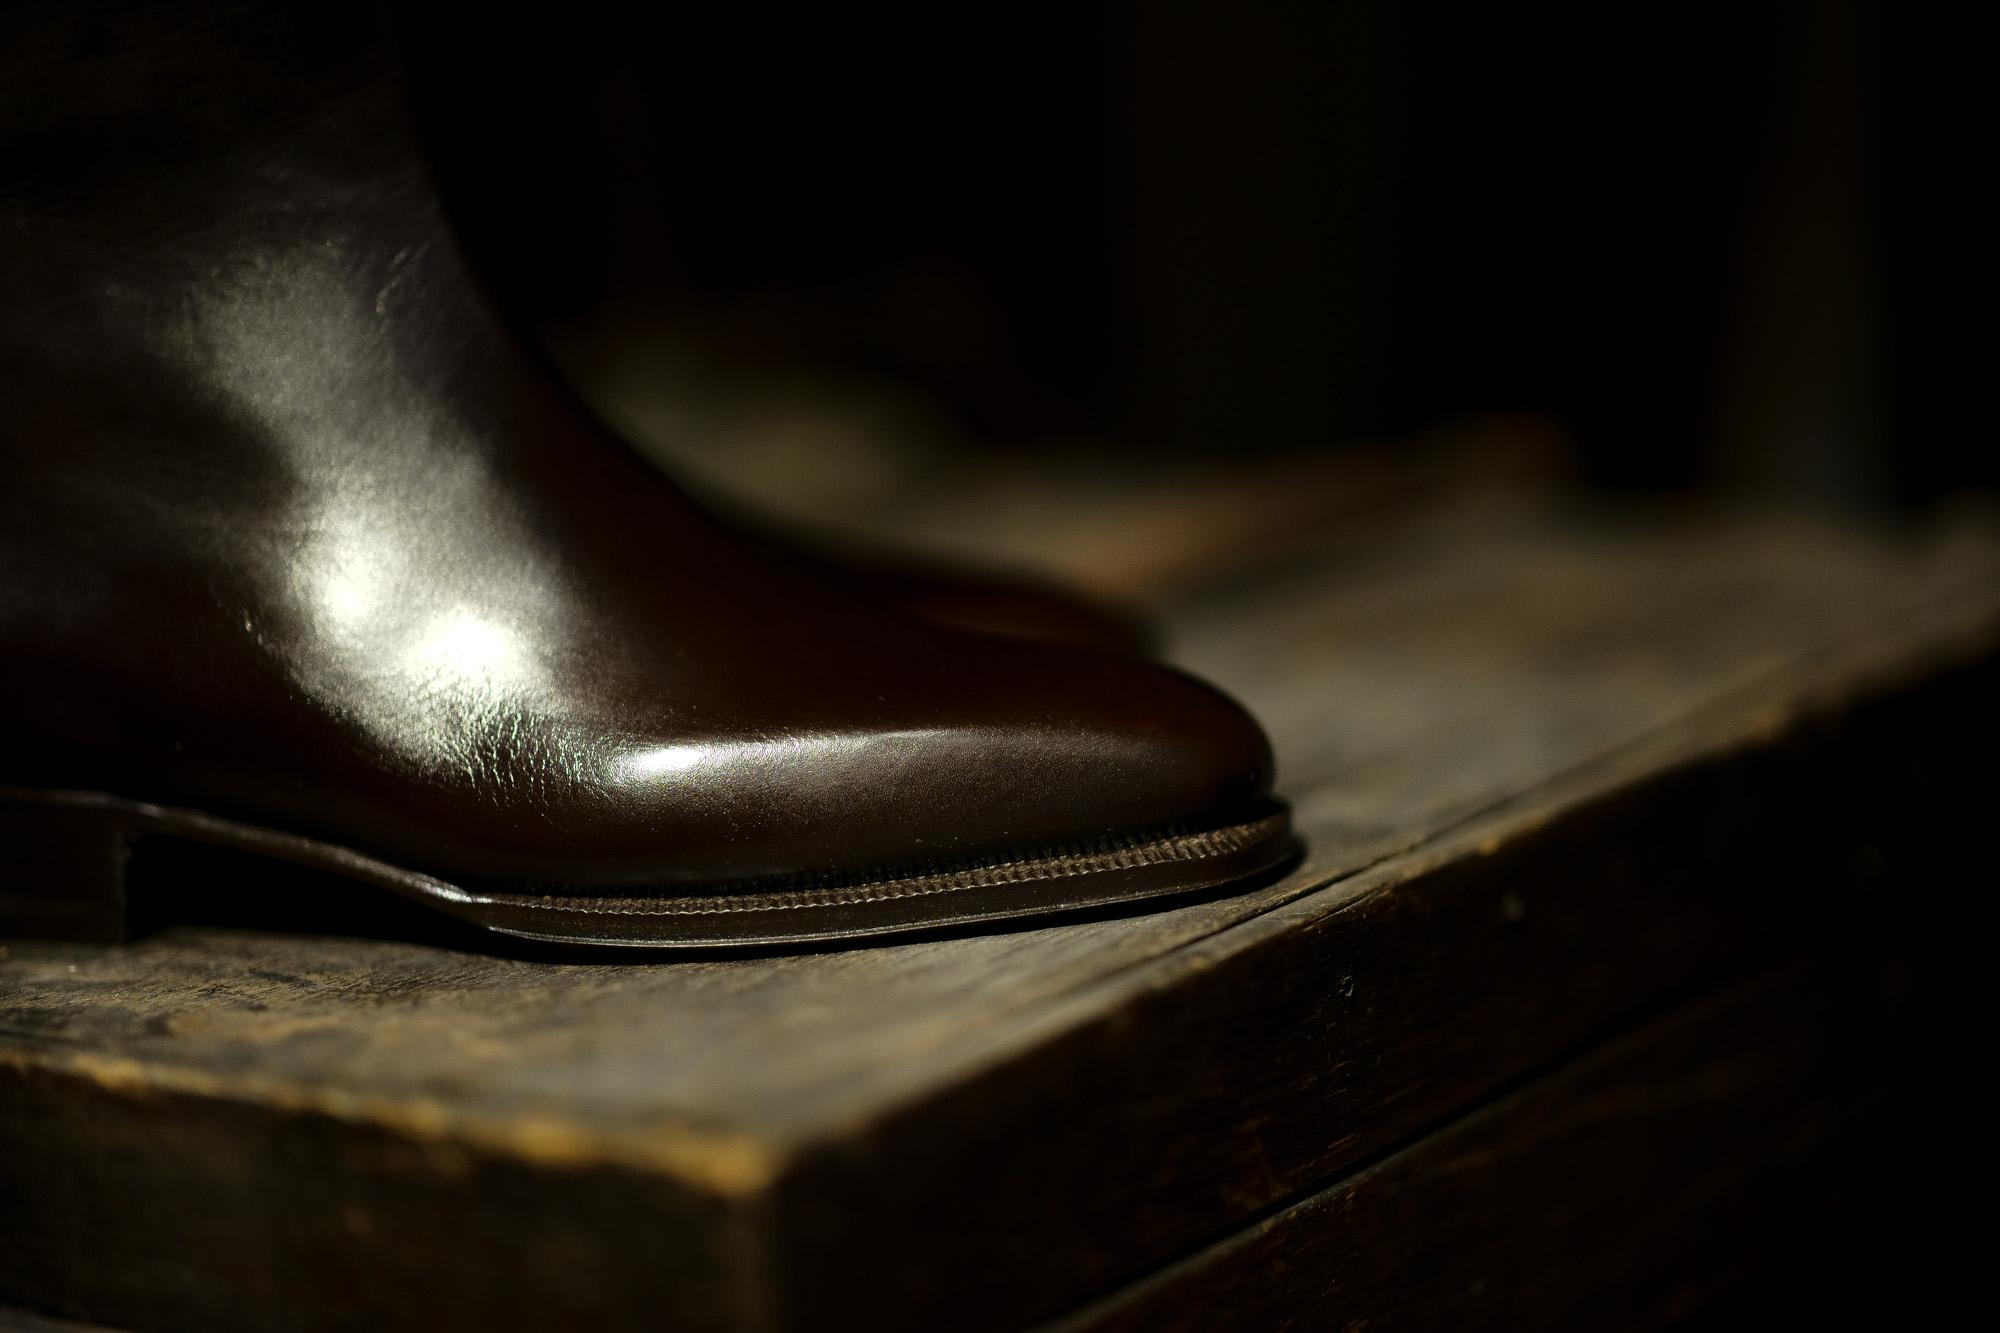 ENZO BONAFE(エンツォボナフェ) ART.3993 Zip up Boots ANILVEAU カーフレザー ジップアップブーツ DARK MELEZE (ブラウン) made in italy (イタリア製) 2021 愛知 名古屋 Alto e Diritto altoediritto アルトエデリット レザーブーツ